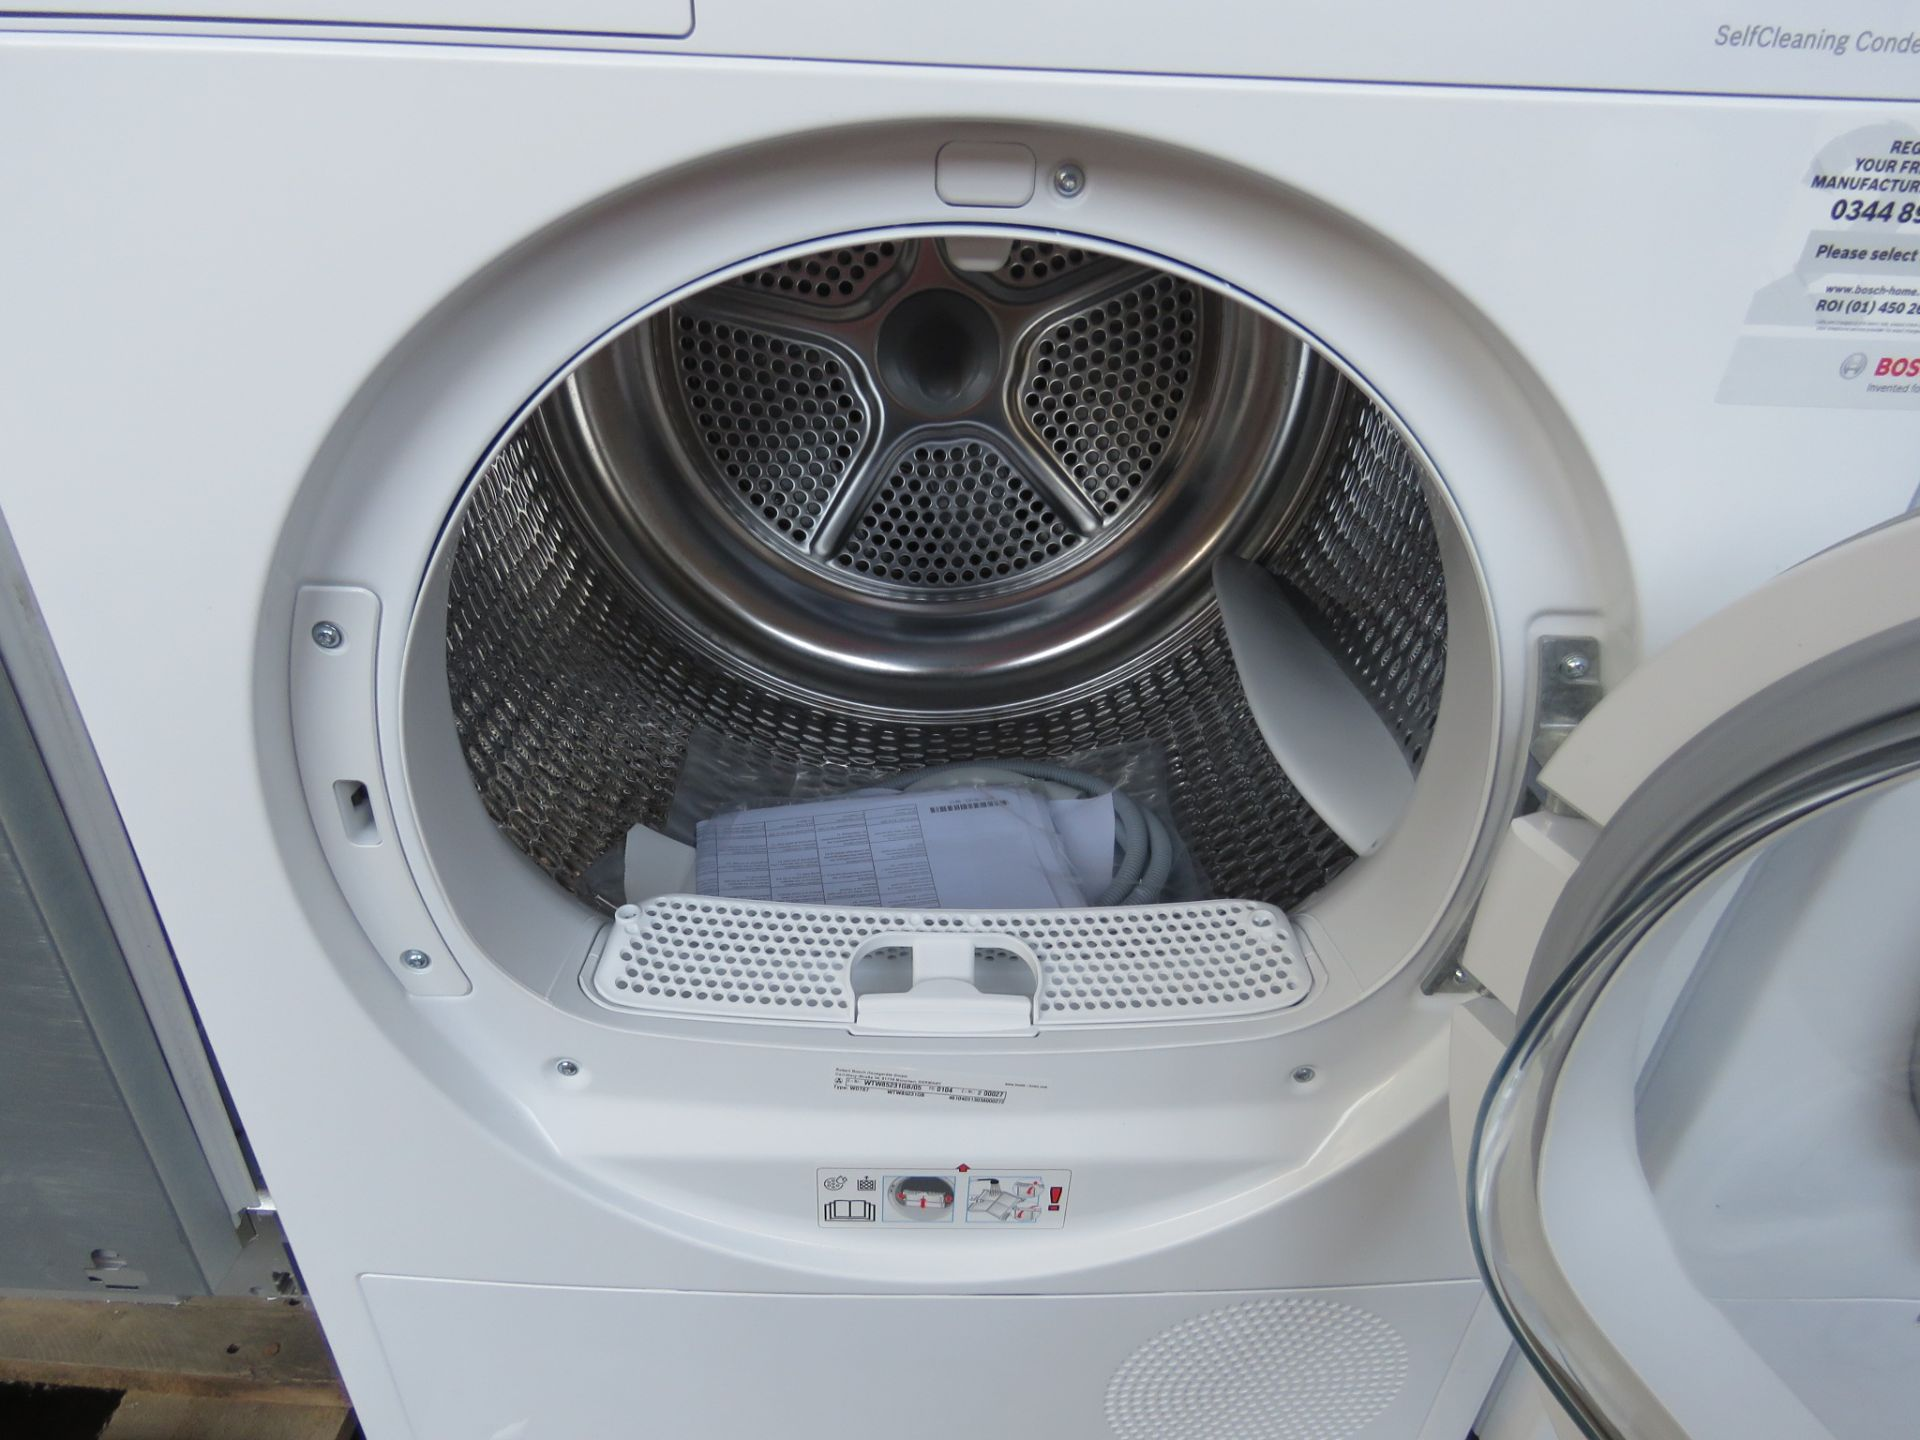 WTW85231GBB Bosch Tumble dryer - Image 2 of 2